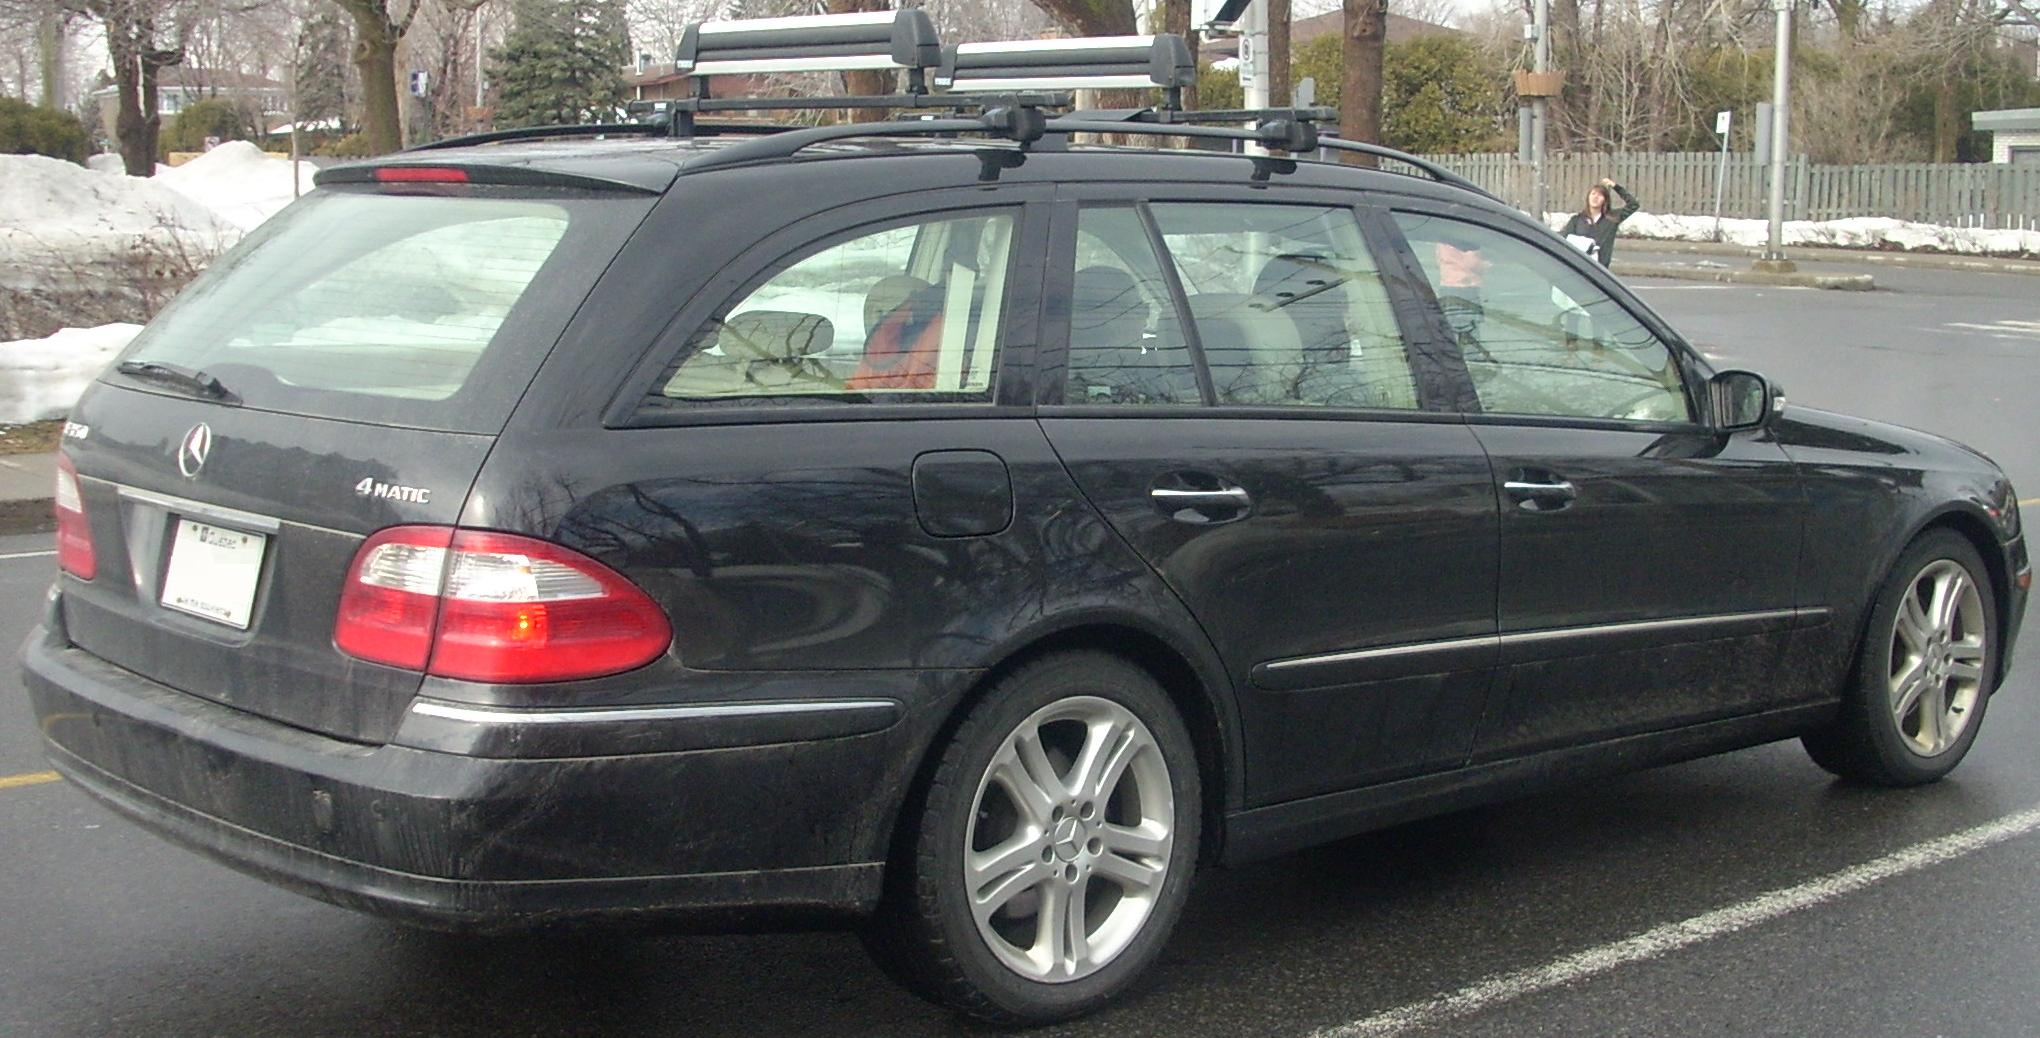 File 39 04 39 06 mercedes benz e350 wagon 4matic jpg for Mercedes benz e350 4matic wagon